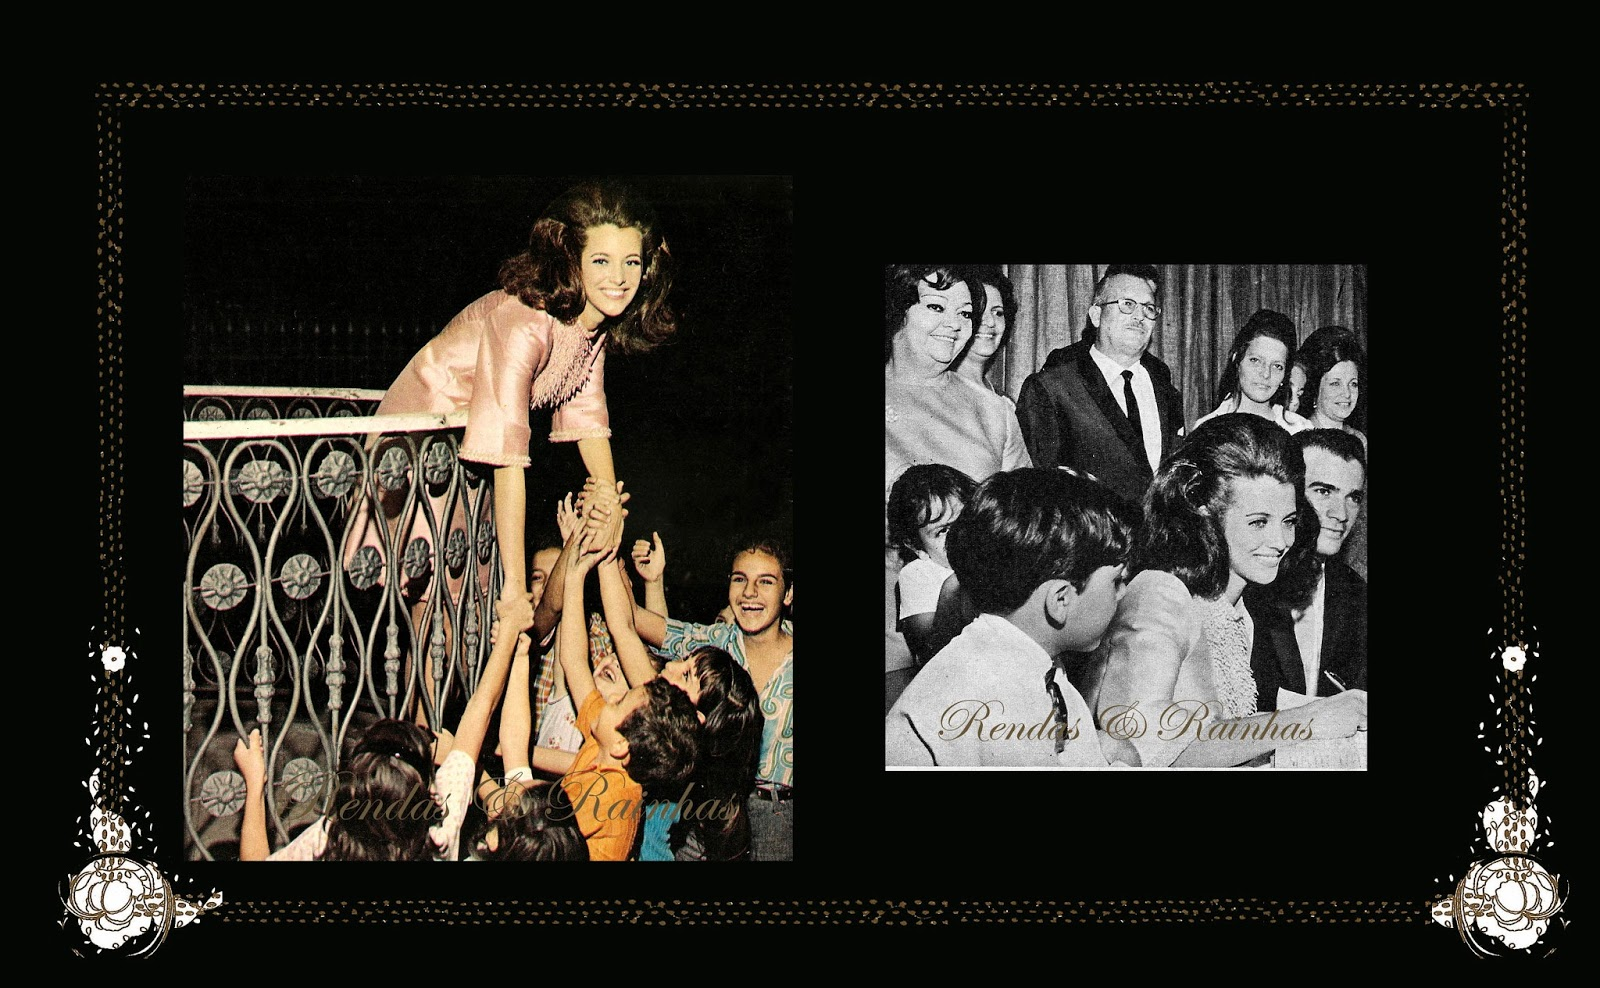 ☽ ✮ ✯ ✰ ☆ ☁ Galeria de Martha Vasconcelos, Miss Universe 1968.☽ ✮ ✯ ✰ ☆ ☁ - Página 2 Iiiprjehf